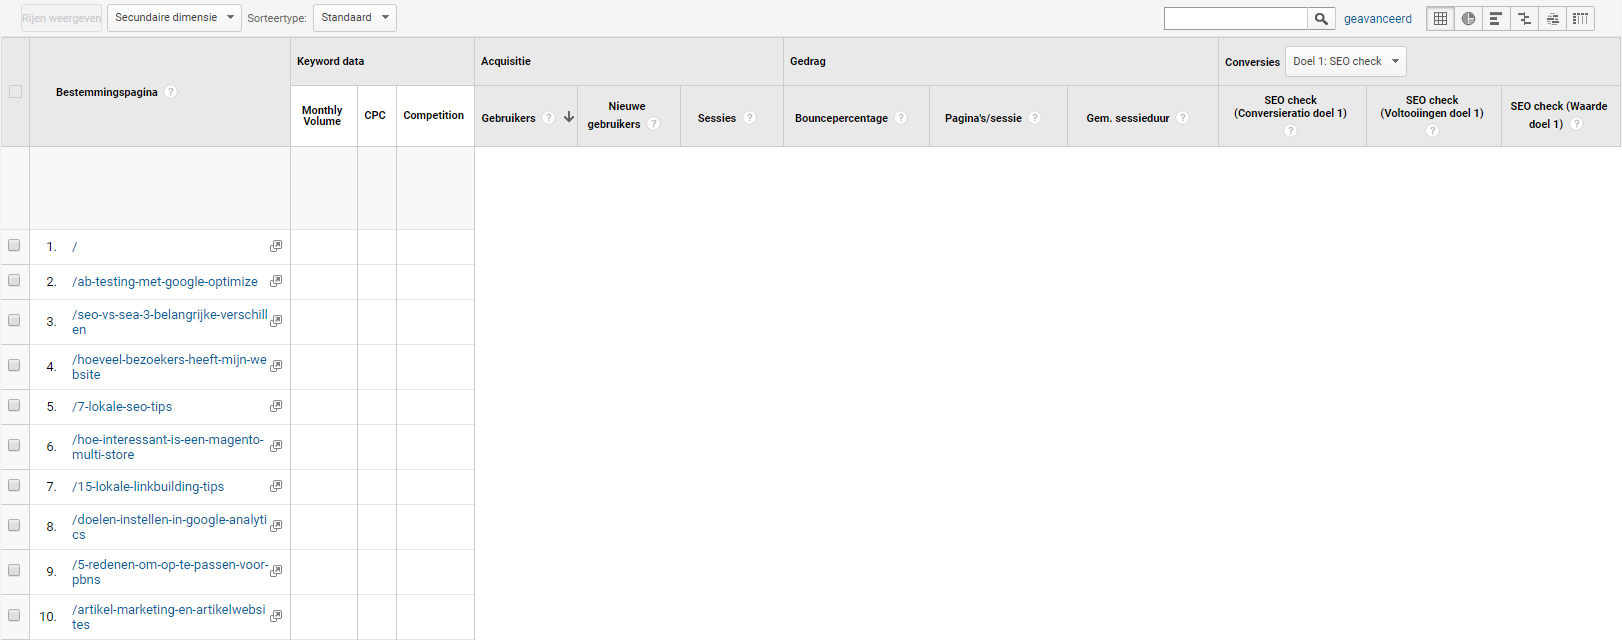 Bestemmingspagina tabel Google Analytics